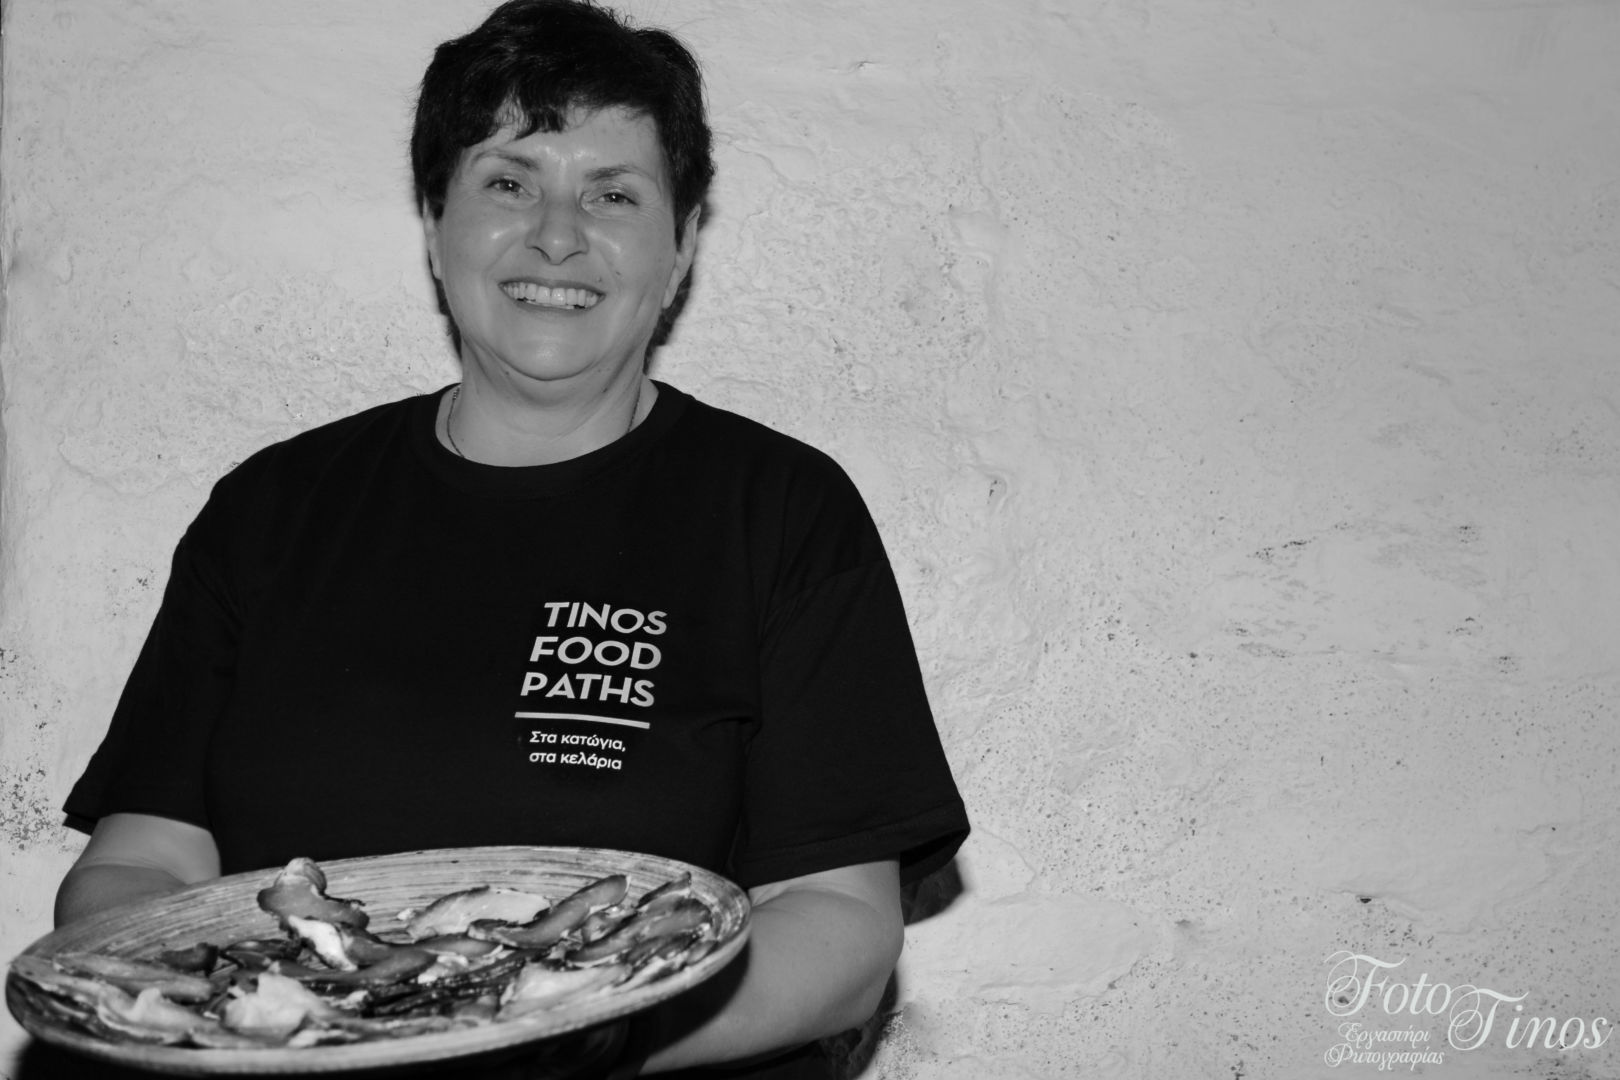 Tinos foodpaths